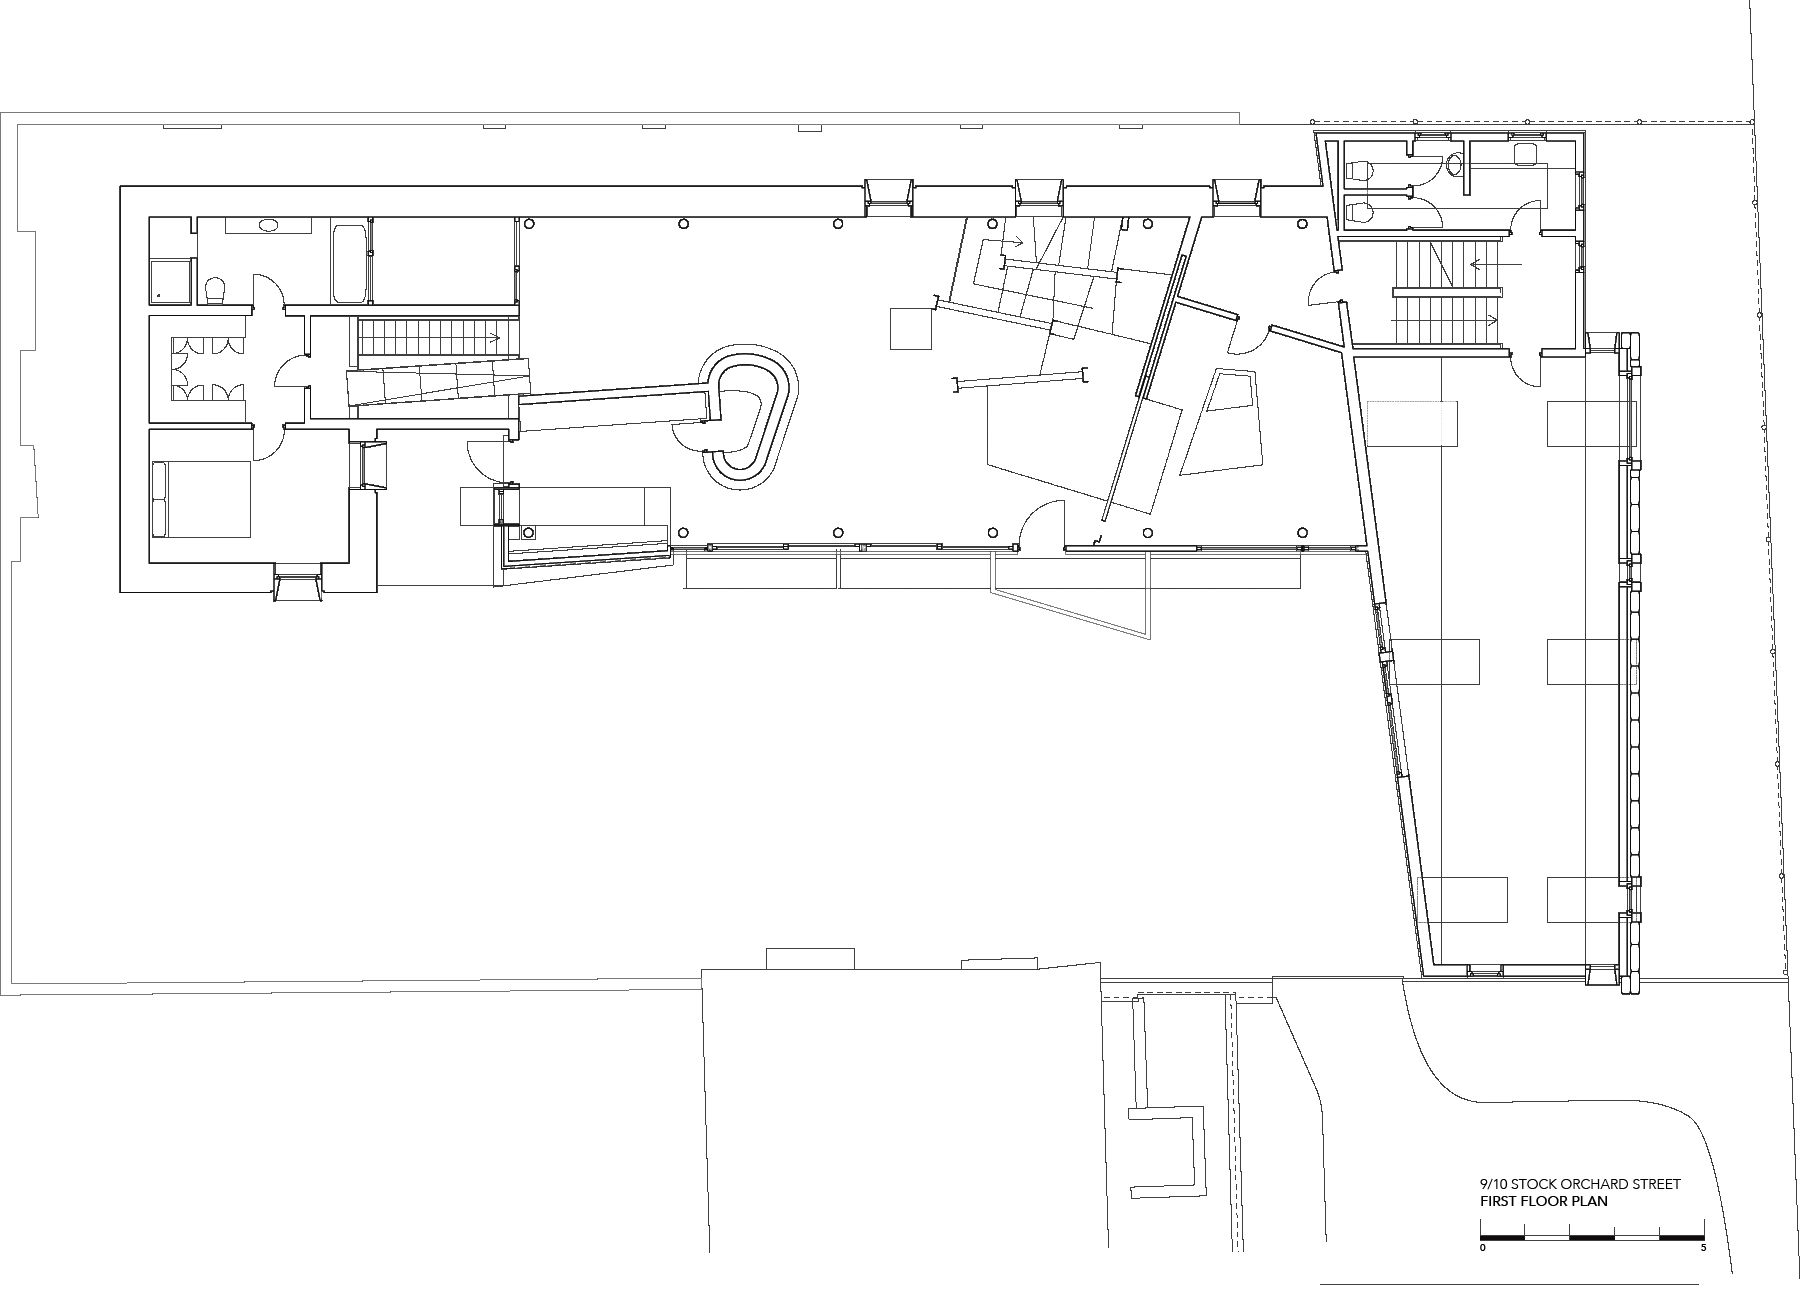 Sarah-Wigglesworth-Architects Stock-Orchard-Street first-floor-plan 1800